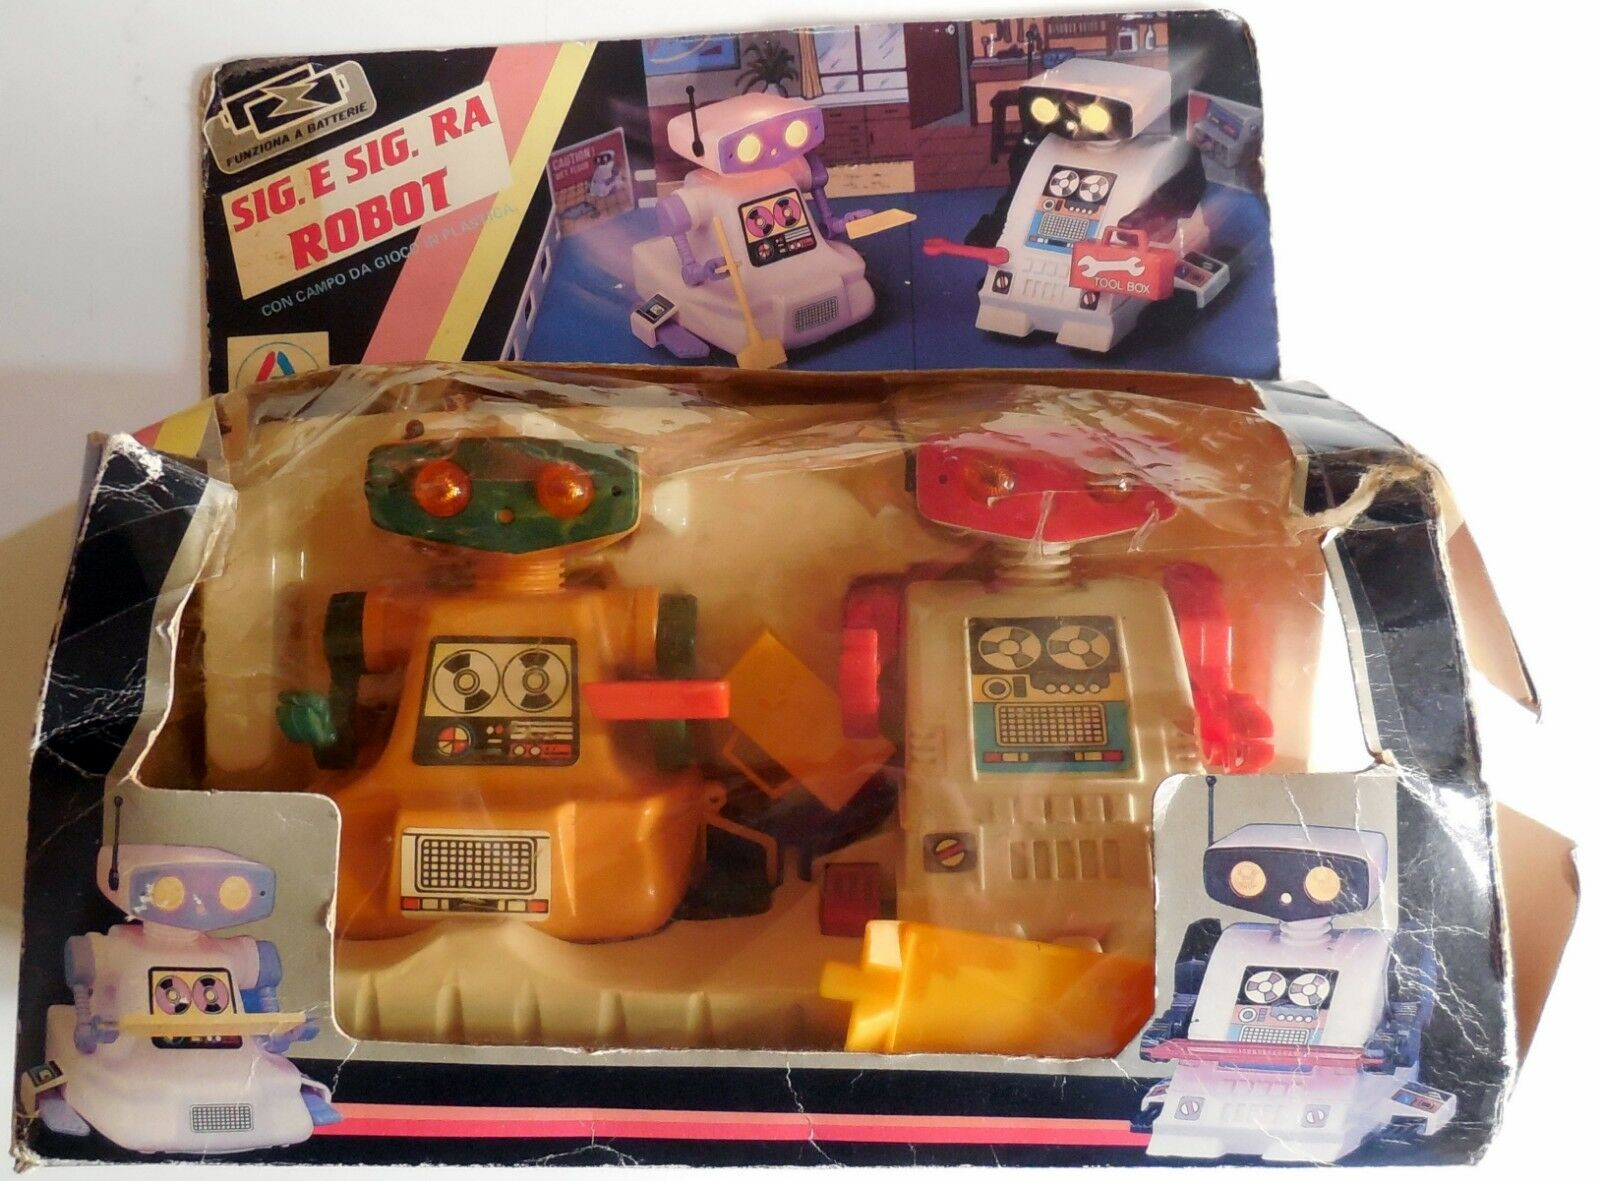 VINTAGE PLASTIC TOY ROBOT SIG, E SIG.RA MR AND MRS MADE HONG KONG 1980s BOXED